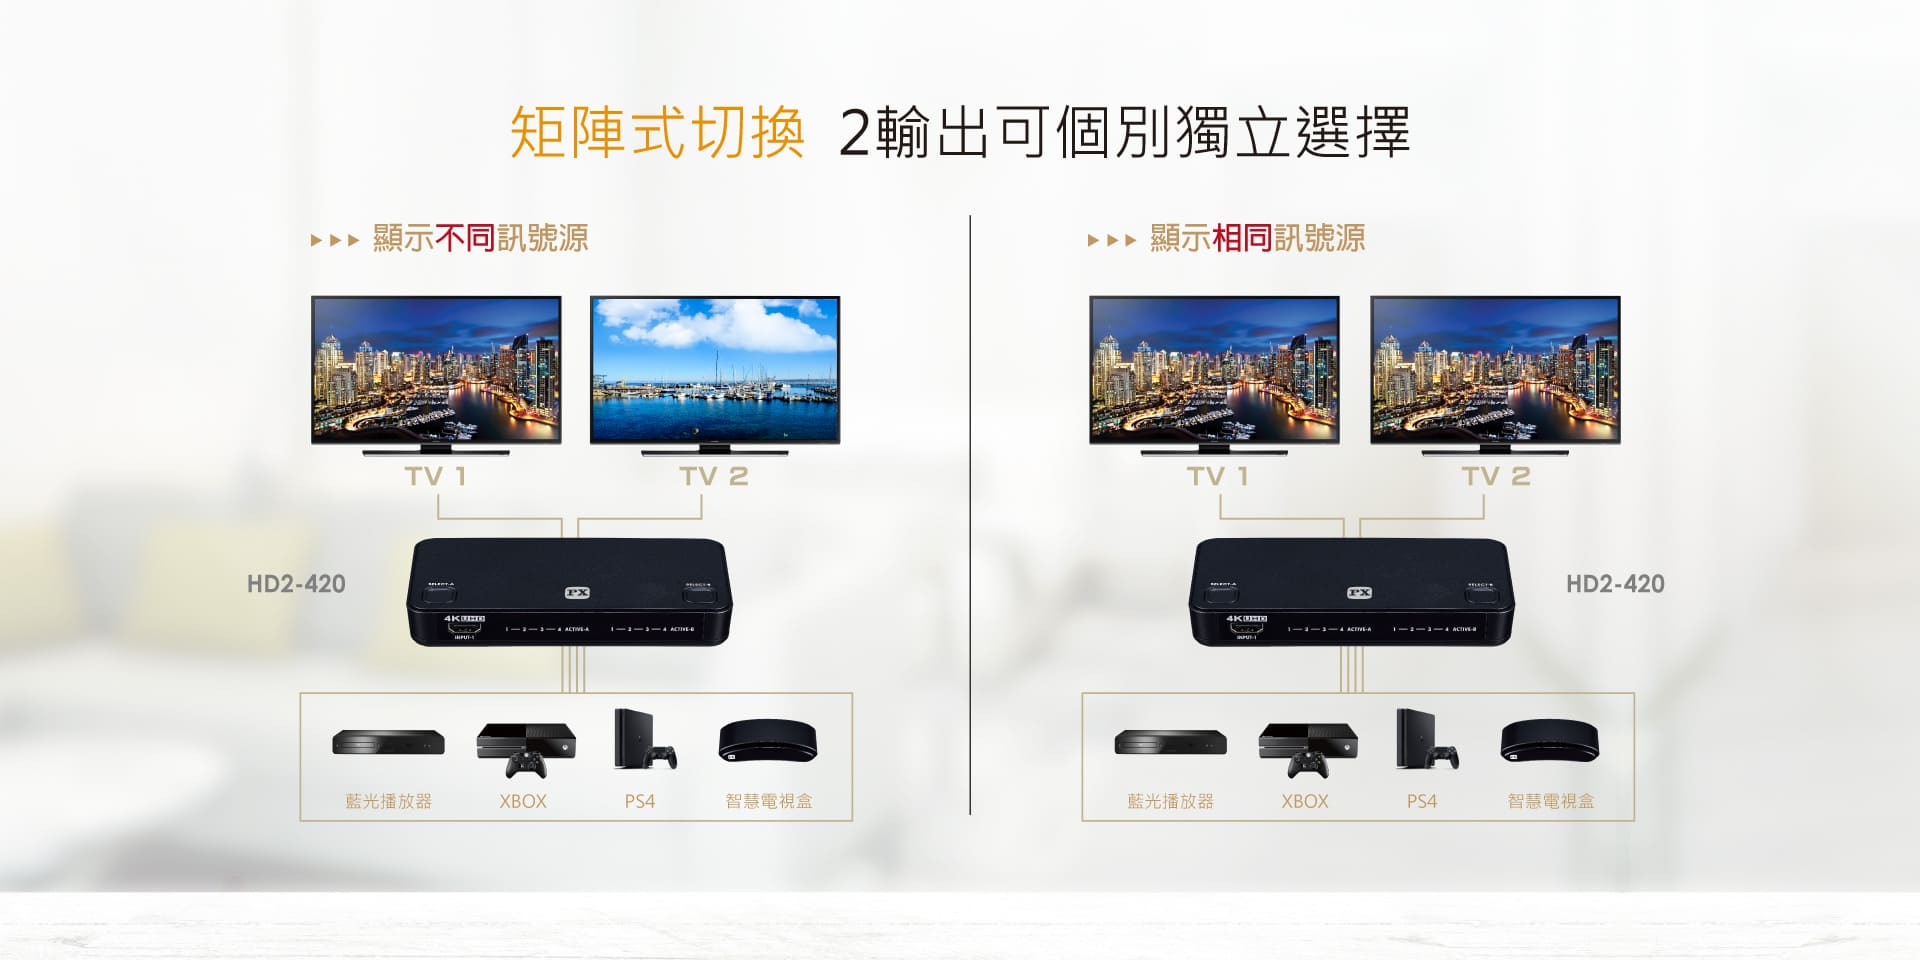 proimages/product/HDMI/HD2-420/HD2-420_04.jpg